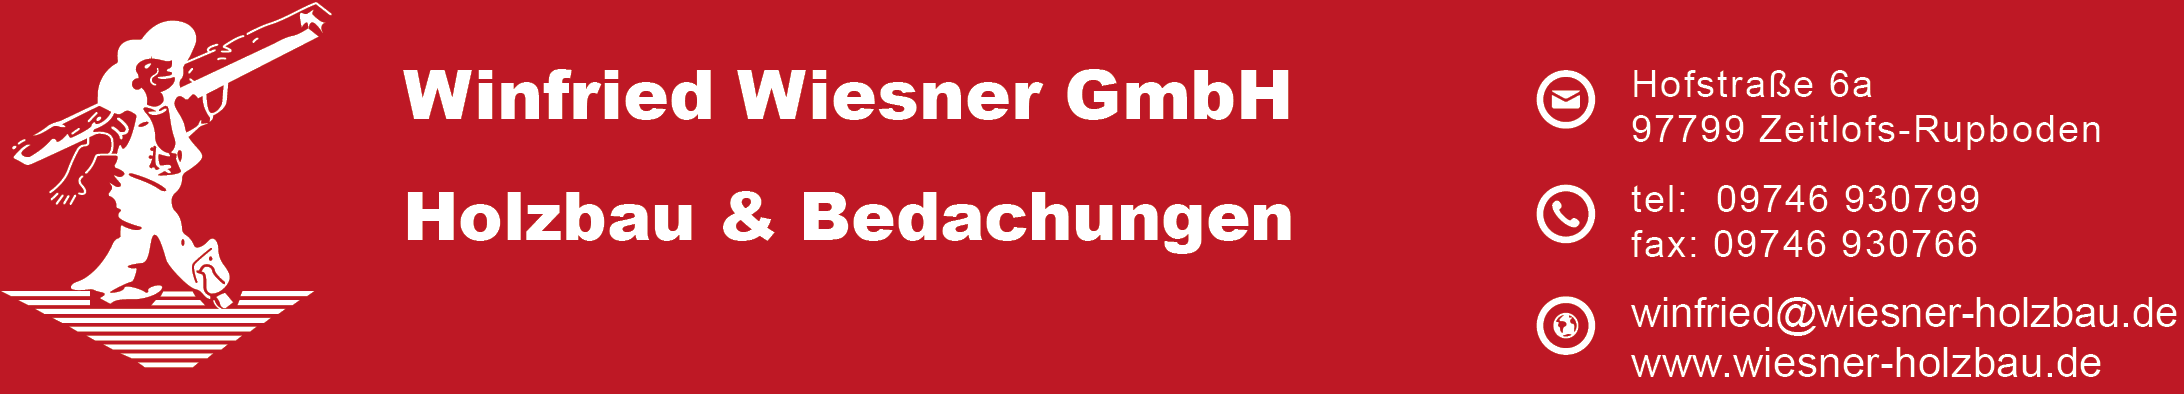 Winfried Wiesner Holzbau & Bedachungen GmbH